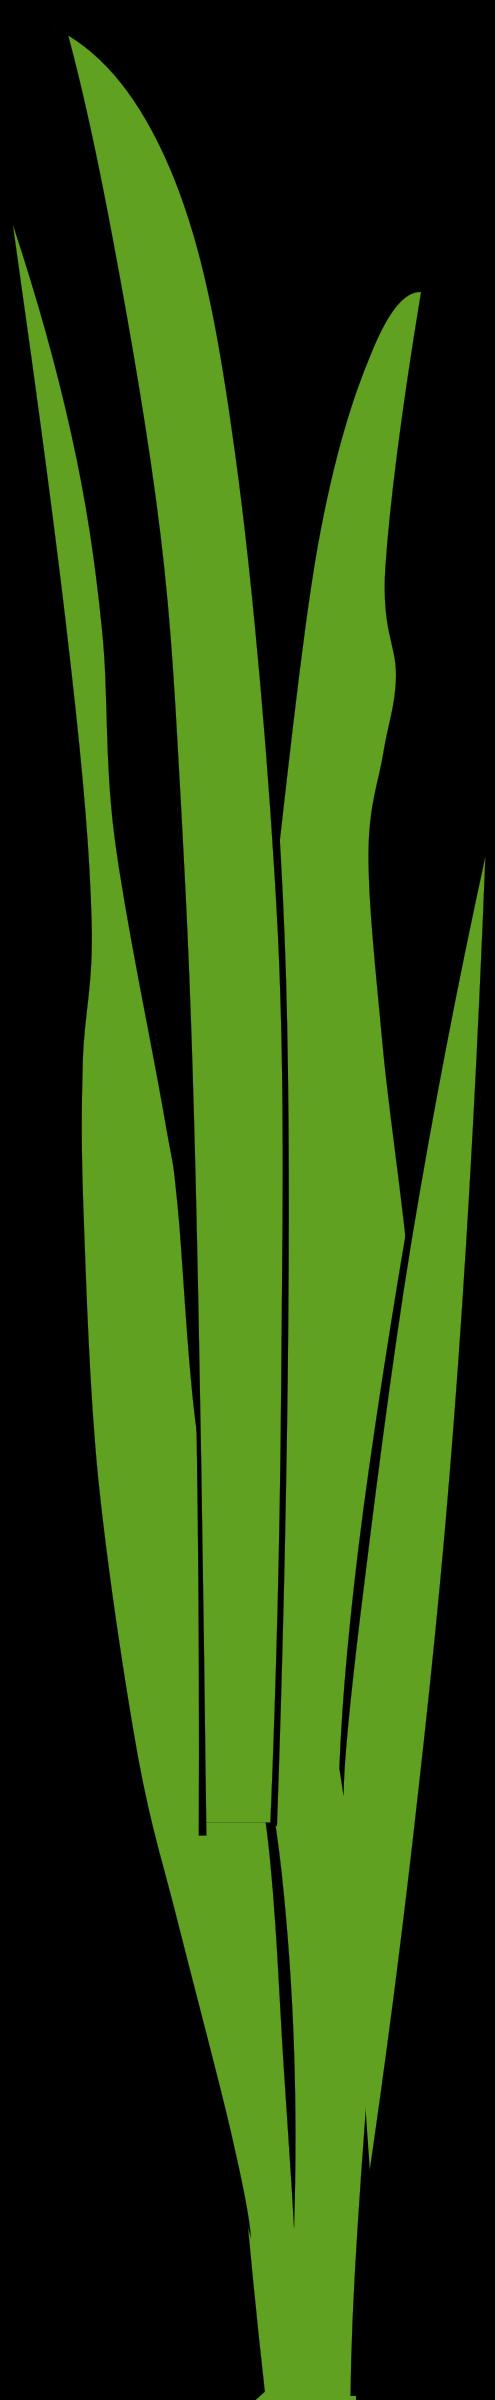 495x2400 Blade Clipart Seagrass